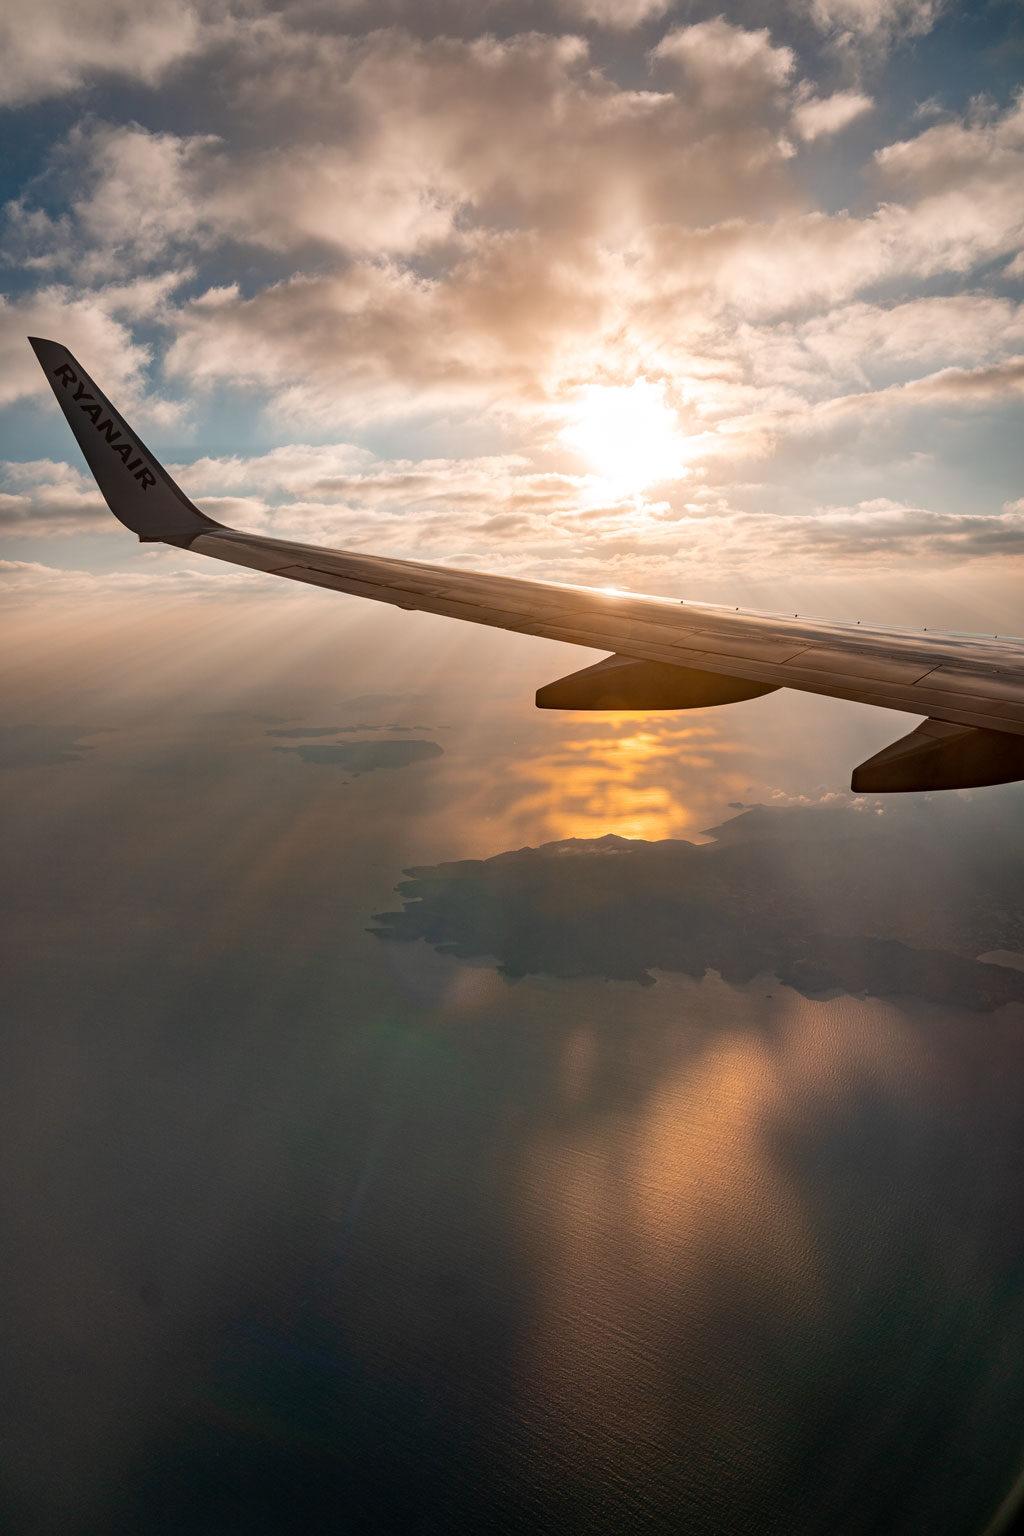 Santorini Sunrise Seen from a Plane